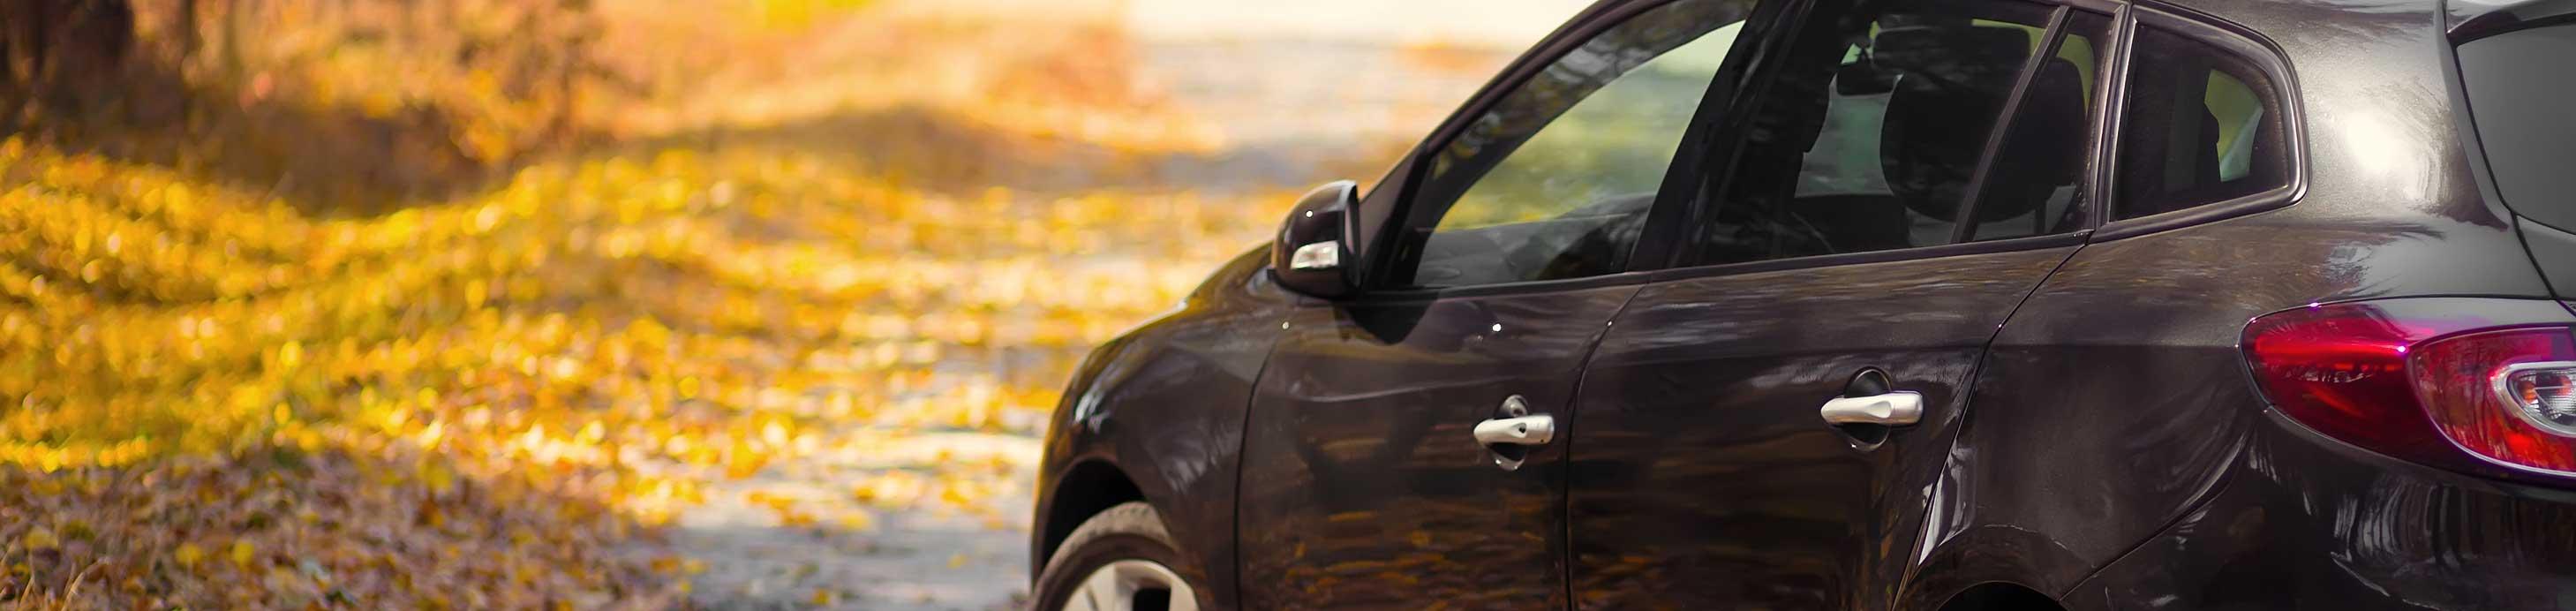 pepperdust htm chevrolet gmu new sedan decatur il lt metallic sale malibu miles for